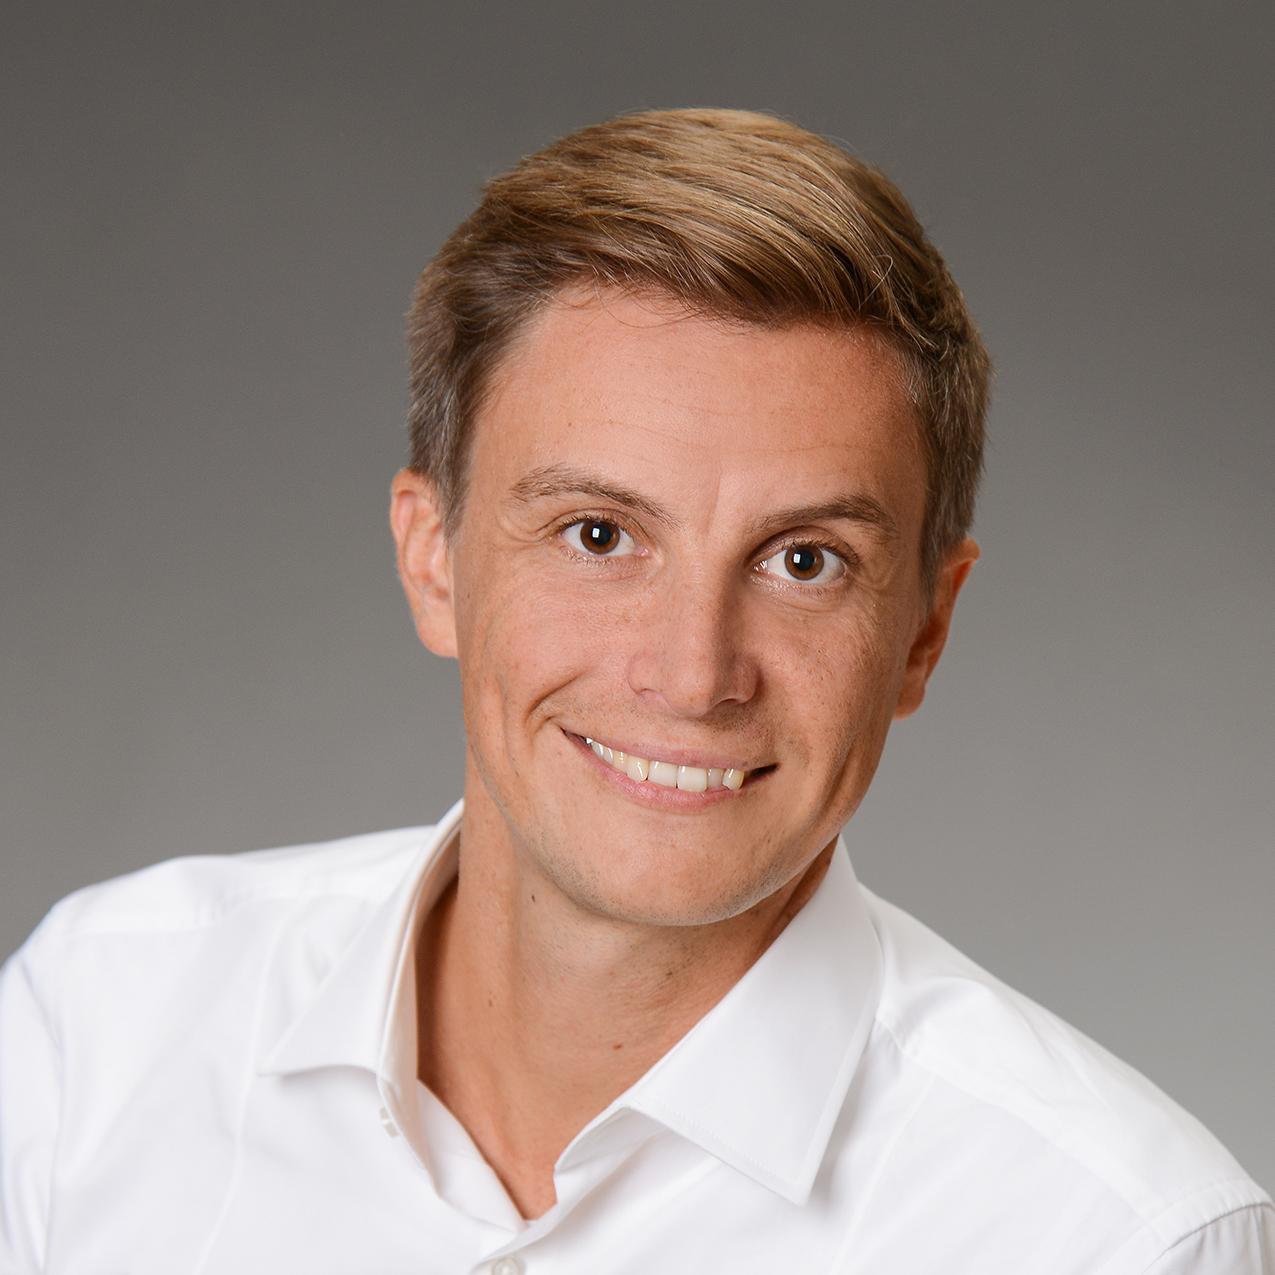 Mr Marc Placzek